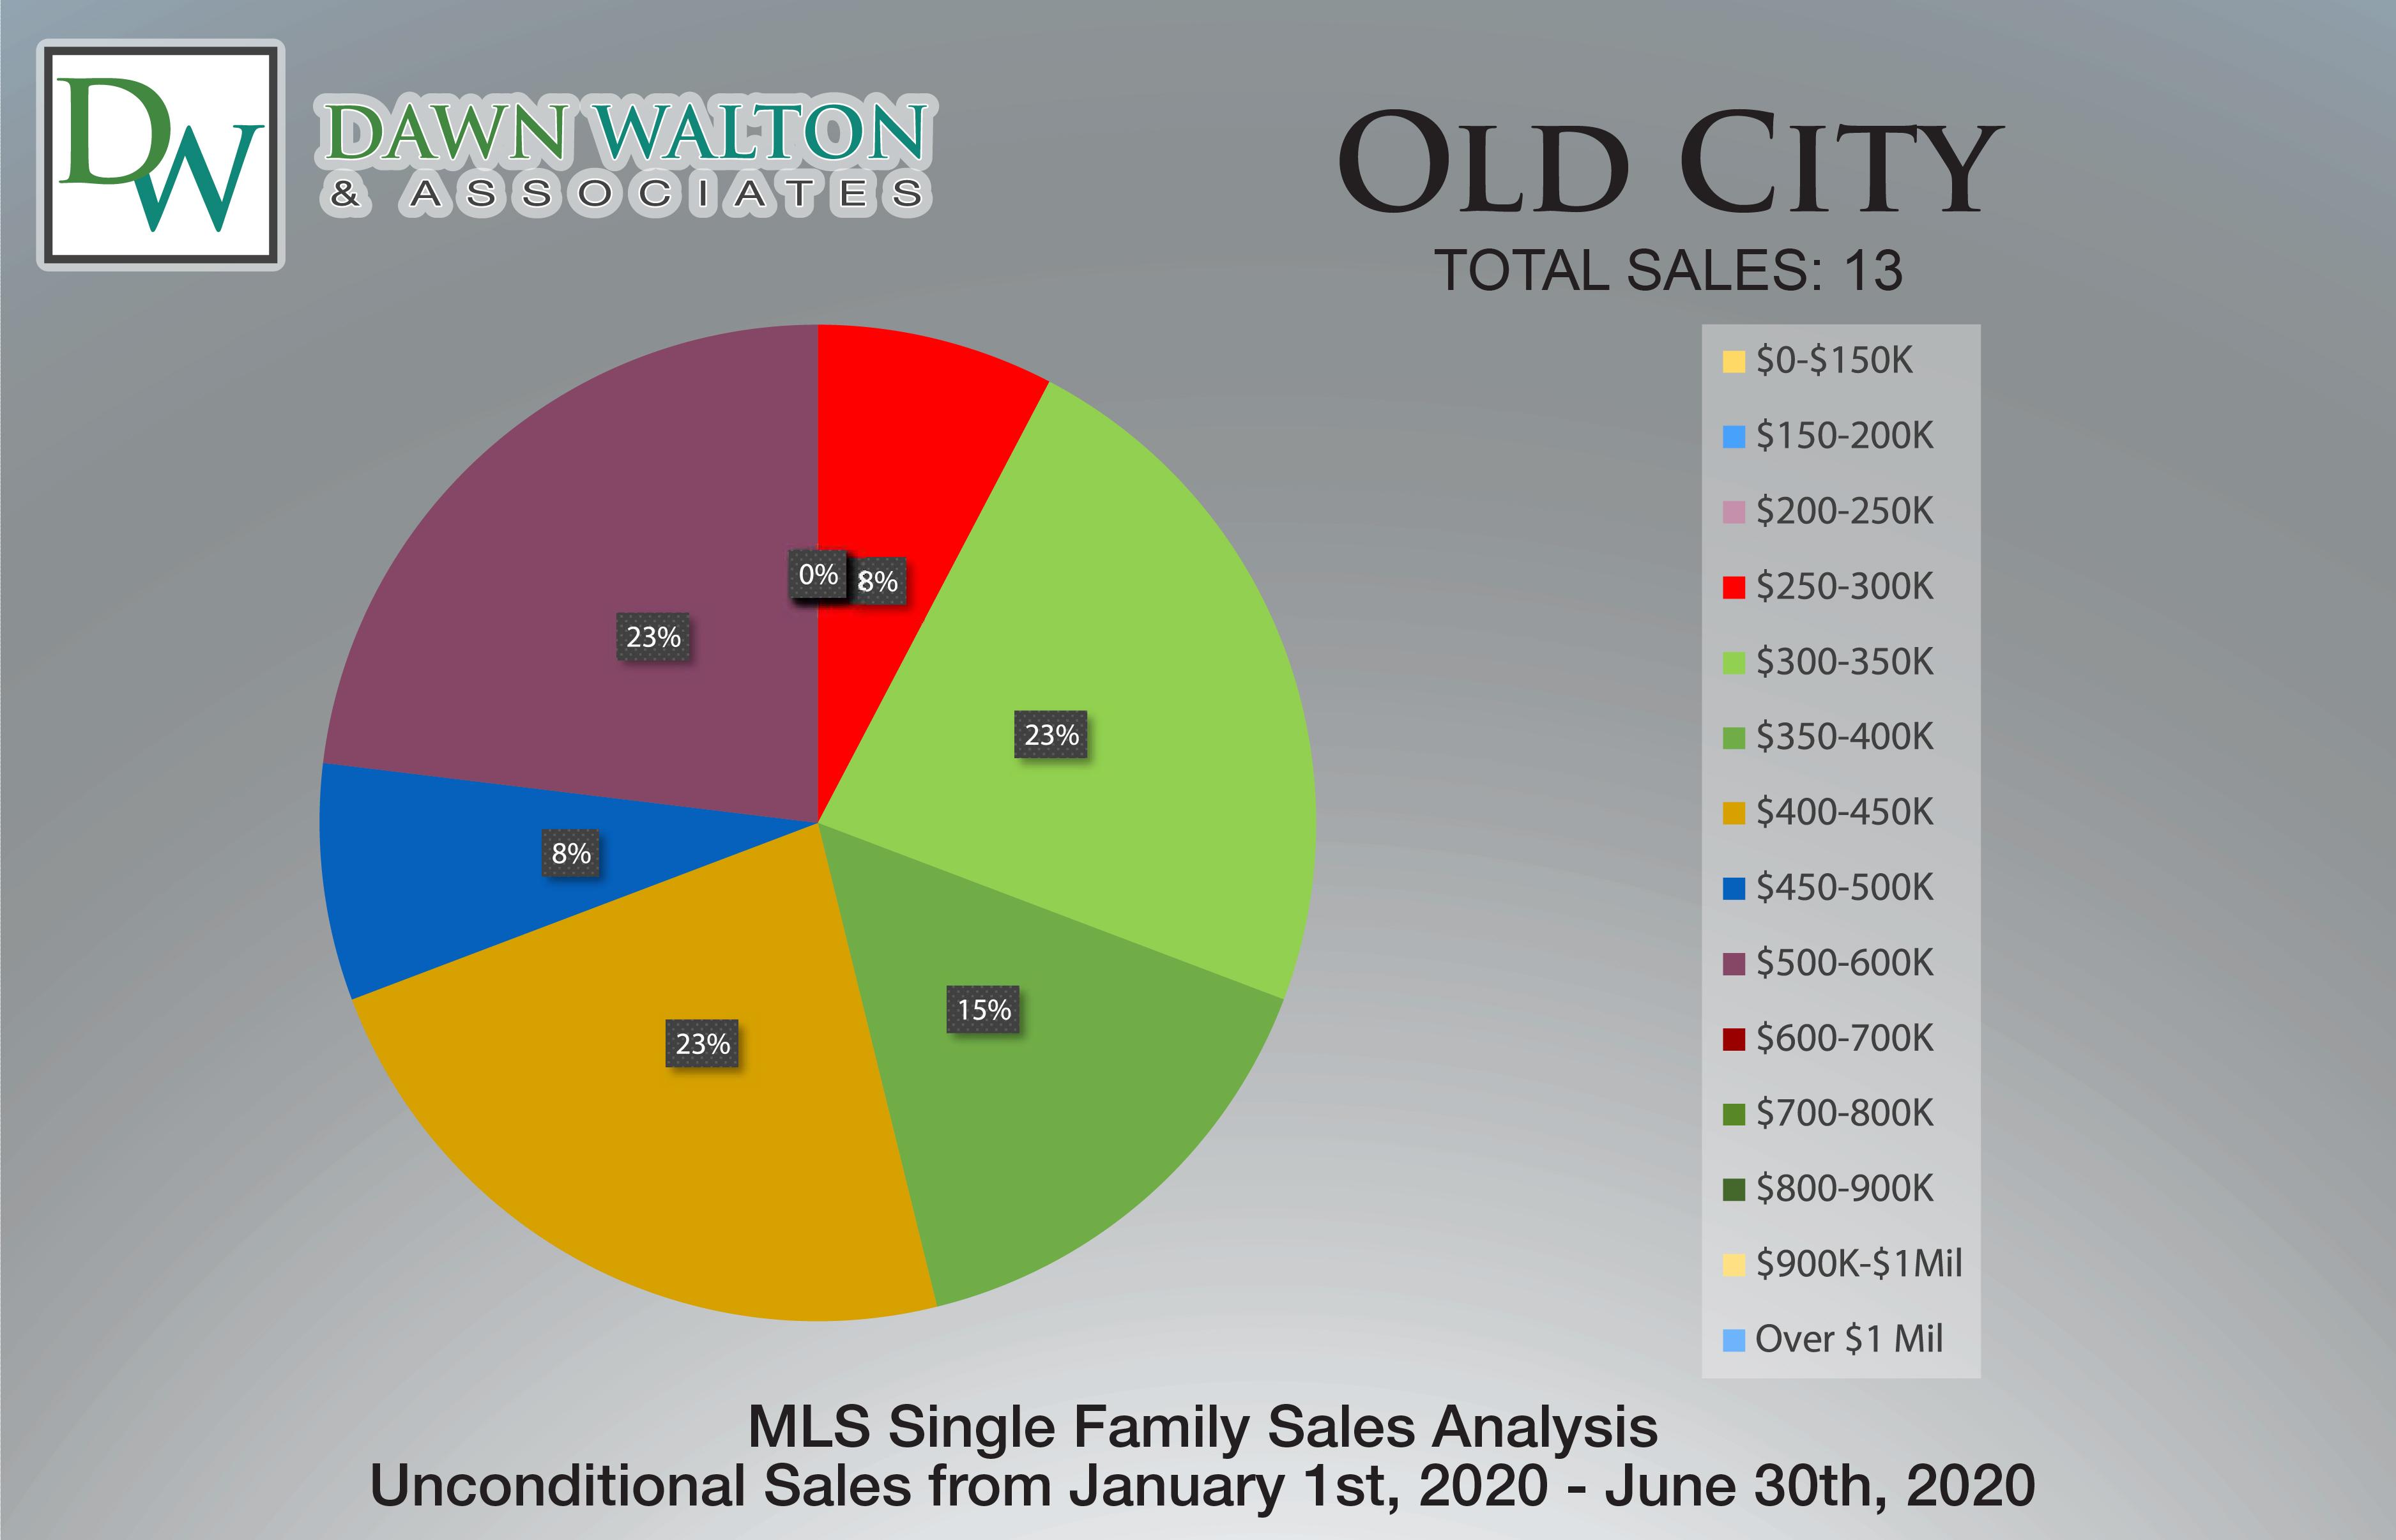 Old City Real Estate Market Stats Price Percentage Jan 1- June 30th  2020 - Nanaimo Realtor Dawn Walton